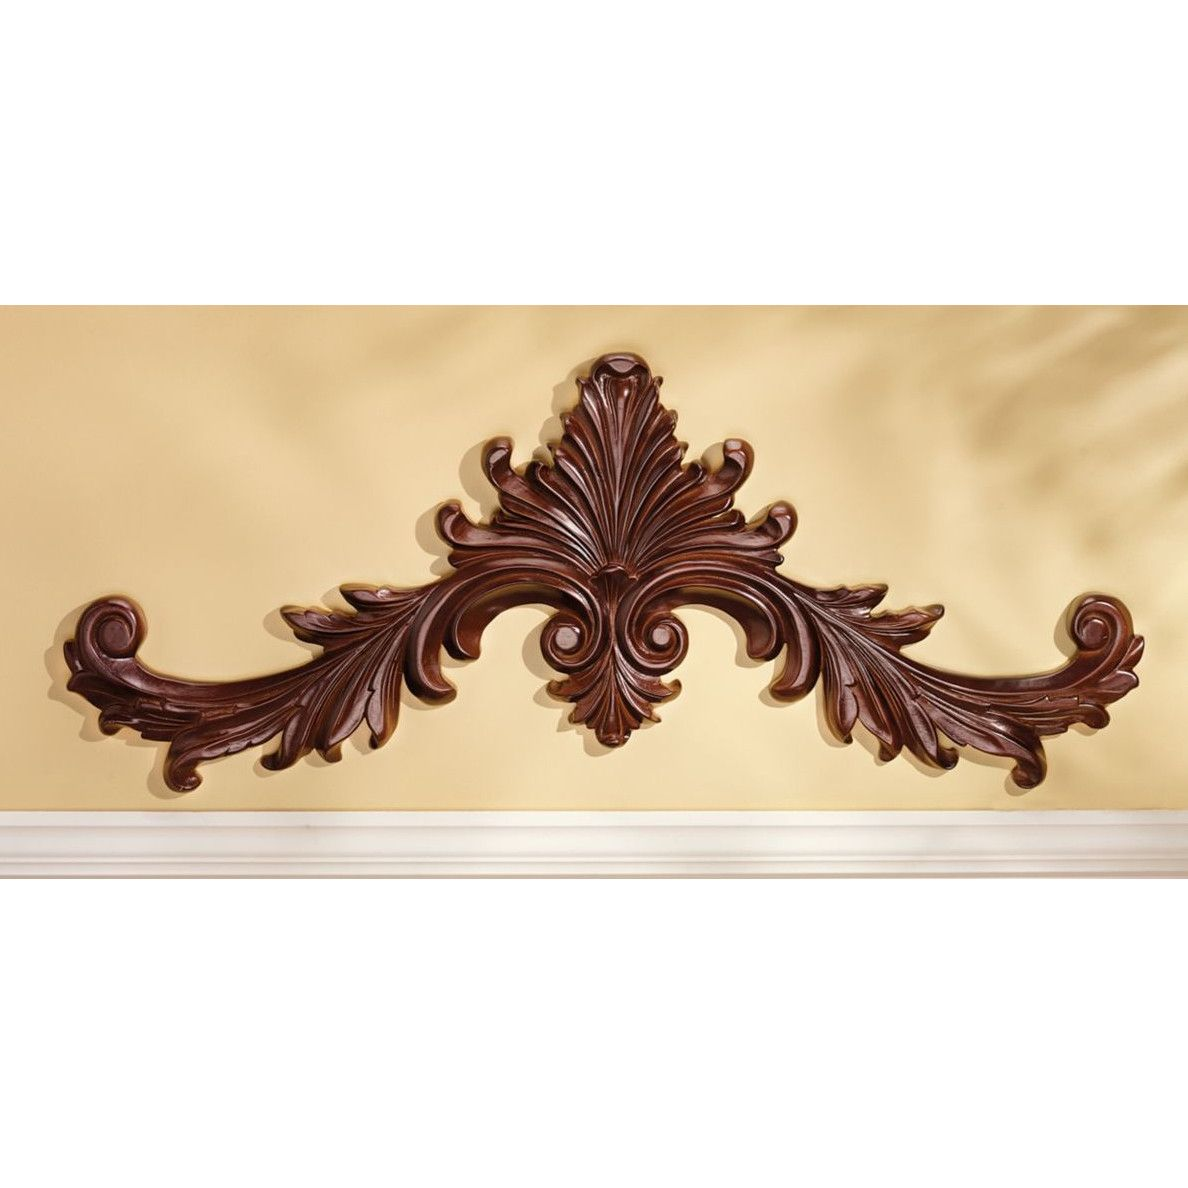 Design Toscano Baroque Architectural Pediment Wall Décor | Art ...